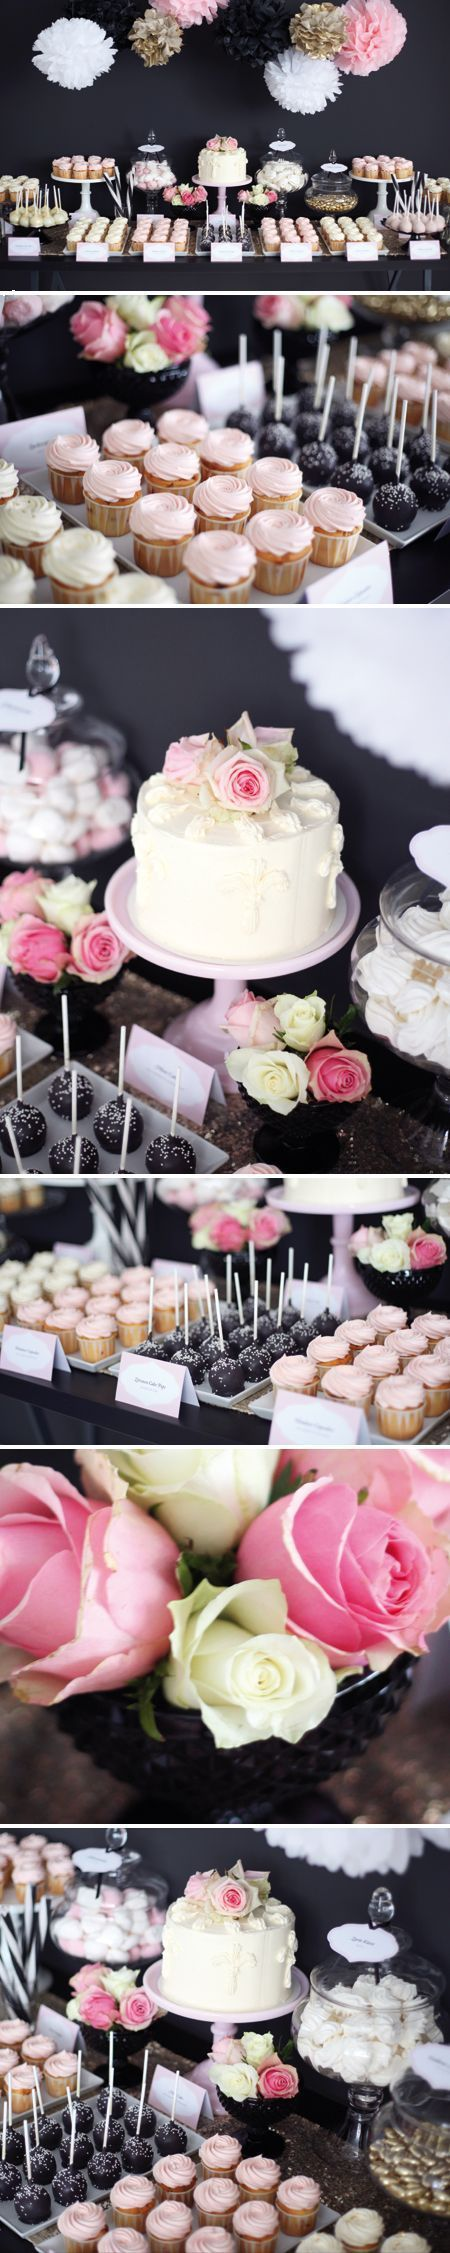 Dark rose Candy Buffet - Zuckermonarchie, Hamburg